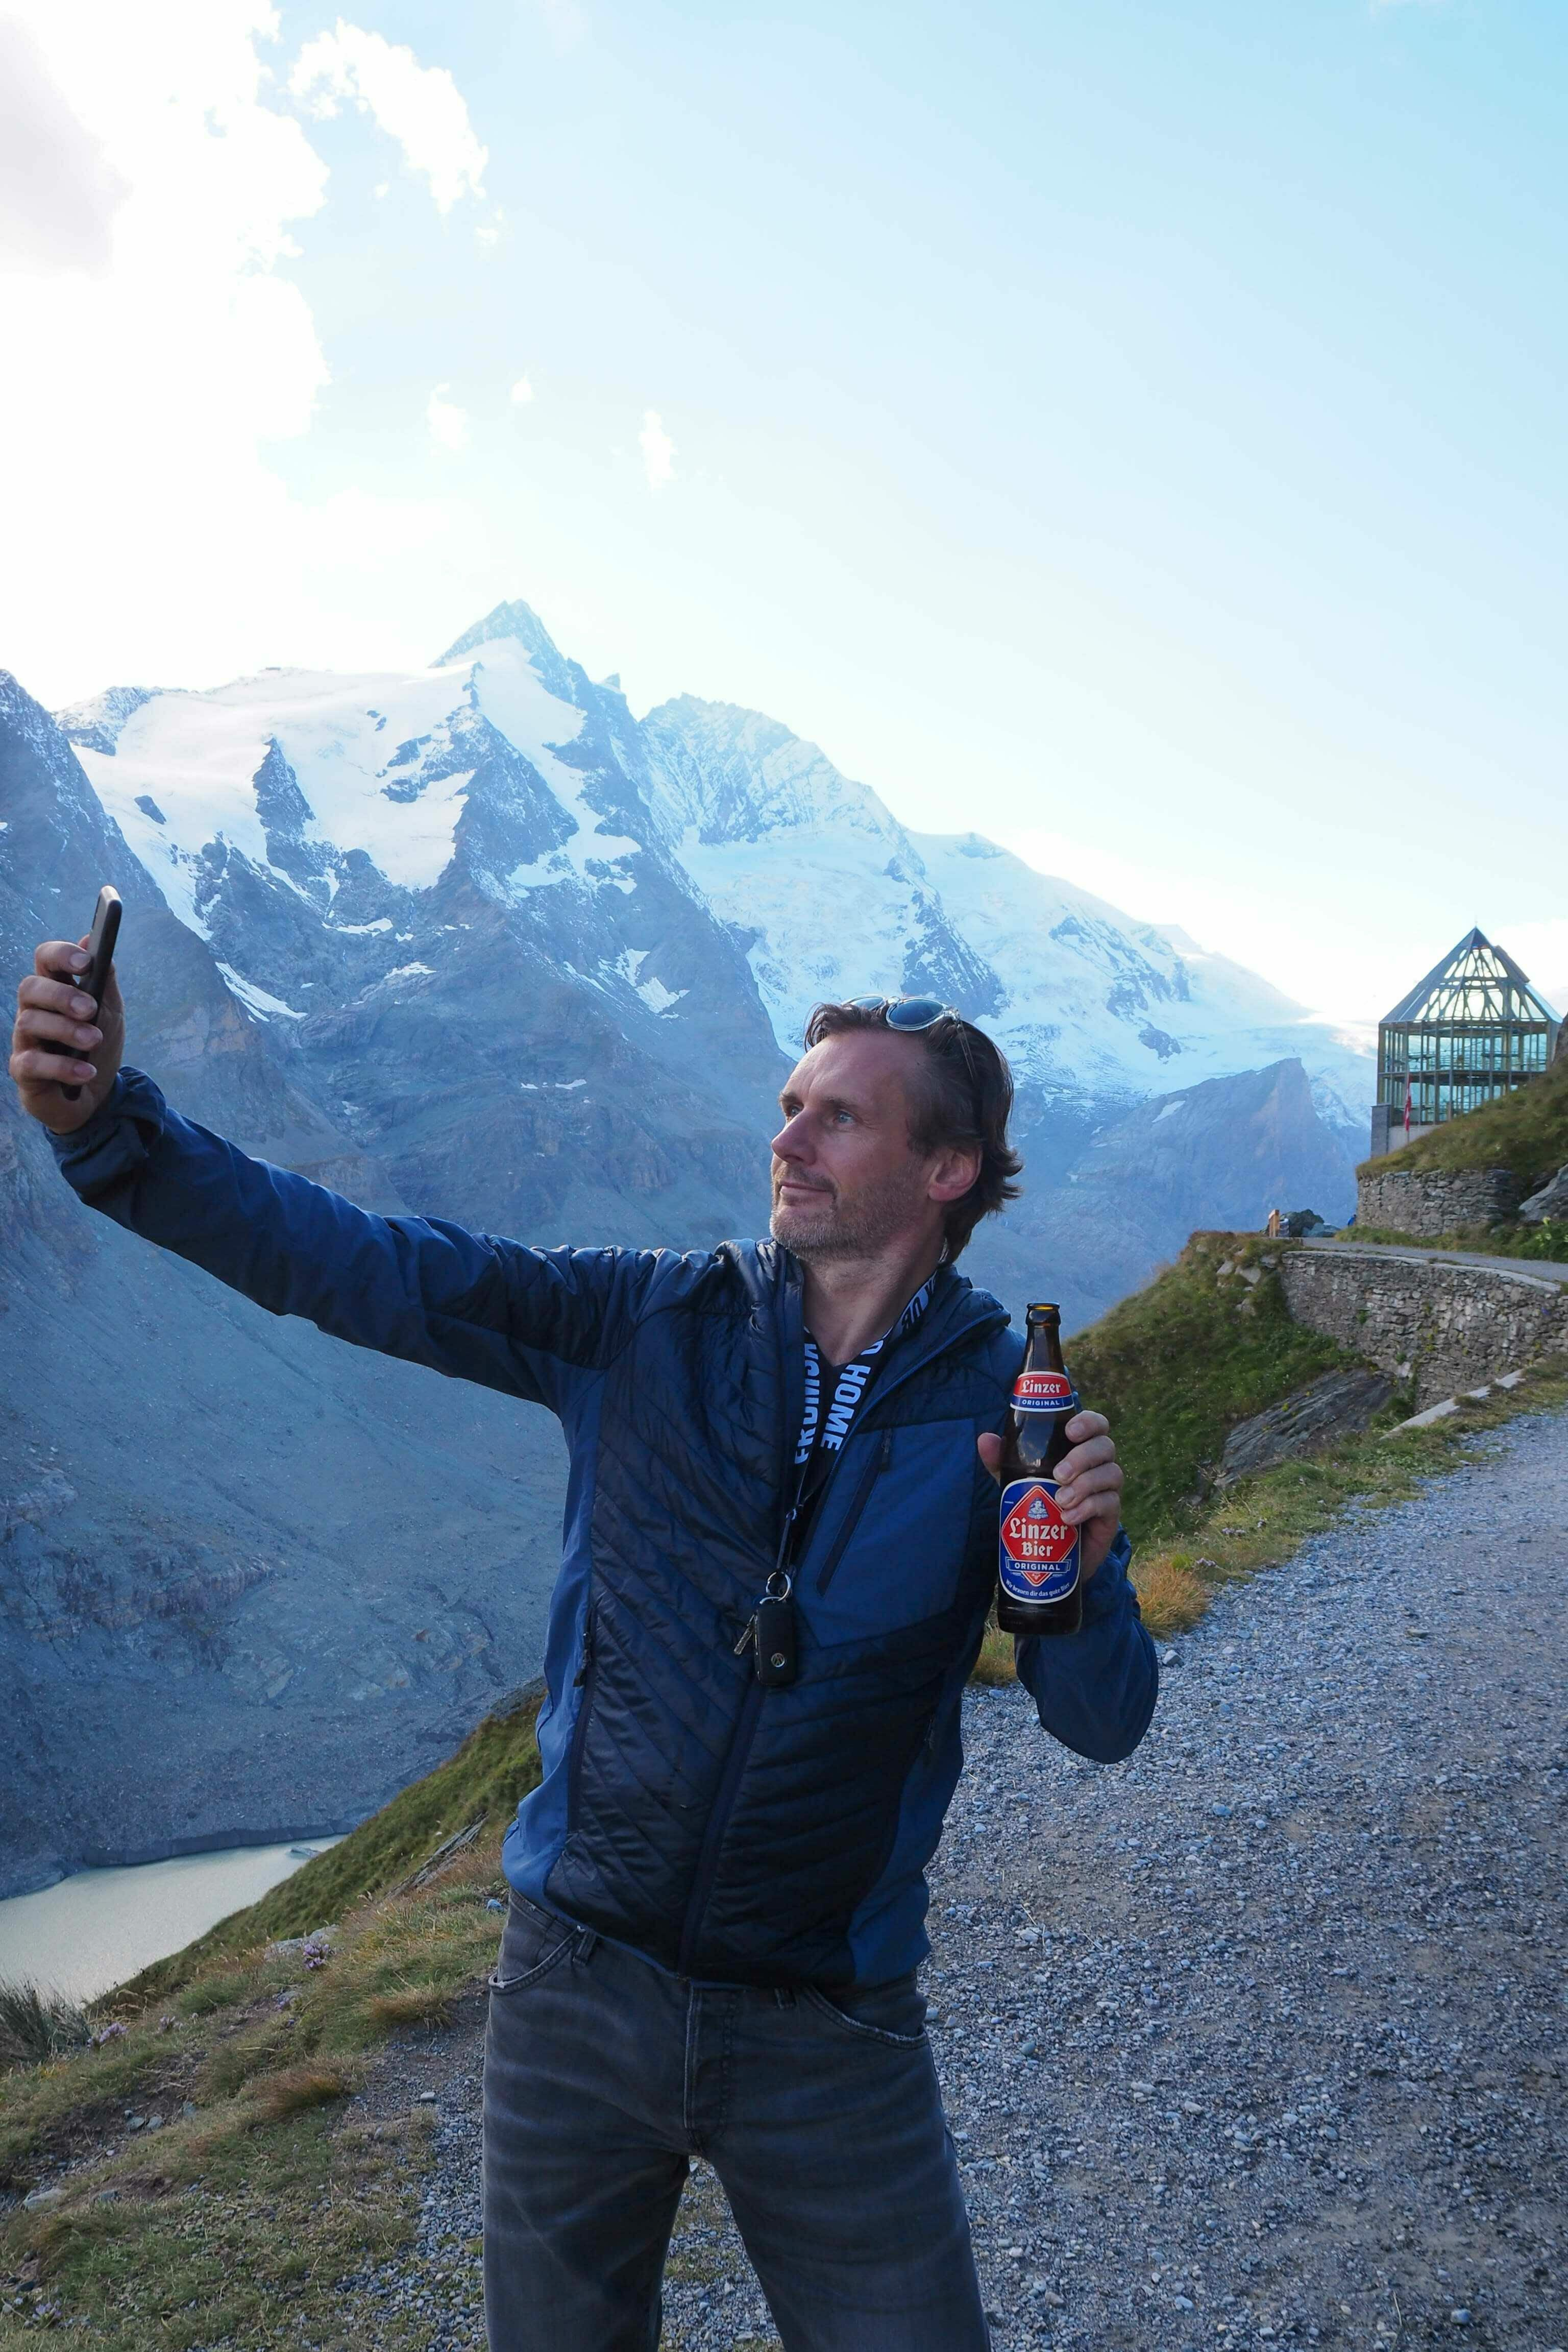 Glockner Andreas Linzer Bier Selfie